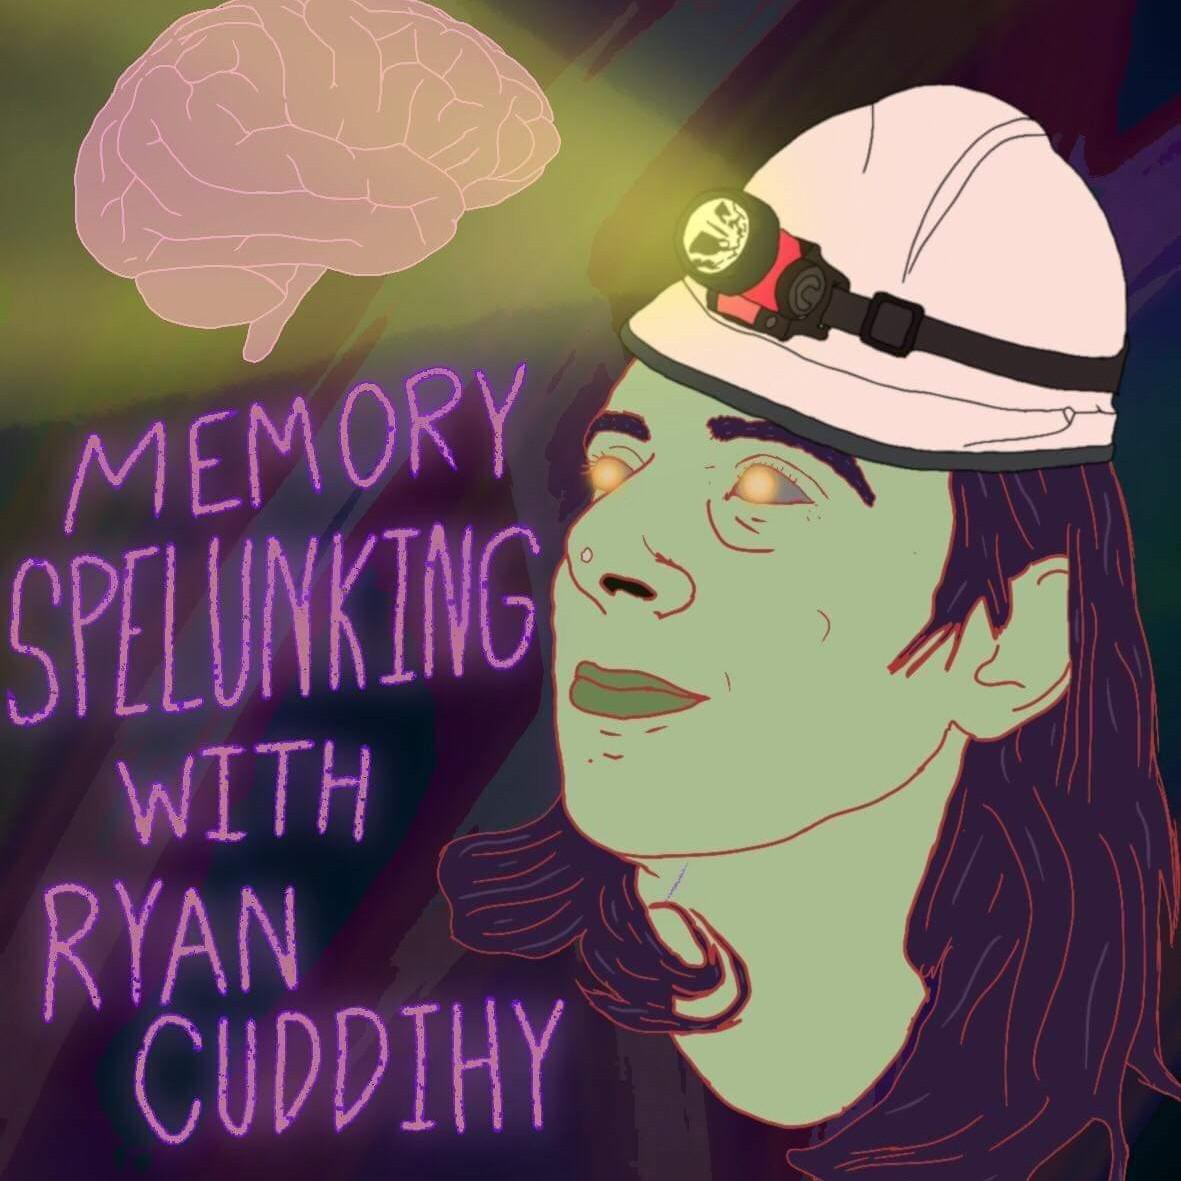 """I Smoke, I Like"" Memory Spelunking with Ryan Cuddihy"